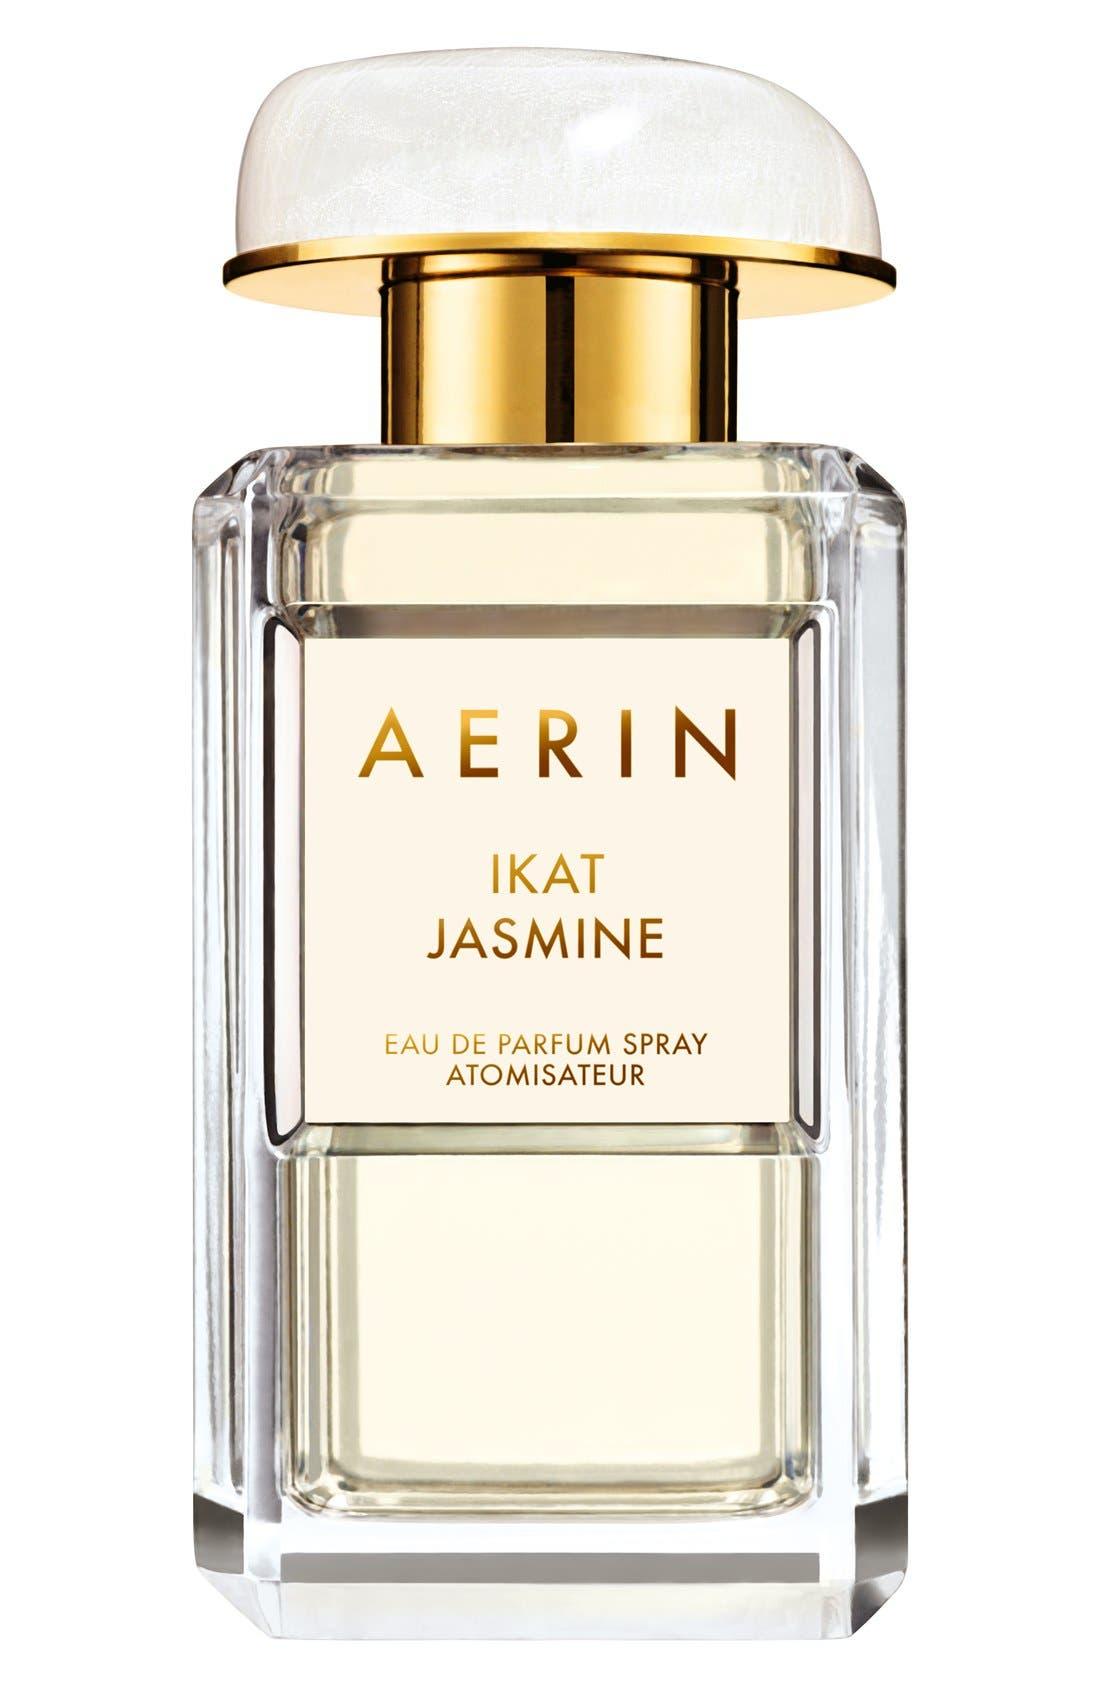 AERIN Beauty 'Ikat Jasmine' Eau de Parfum Spray